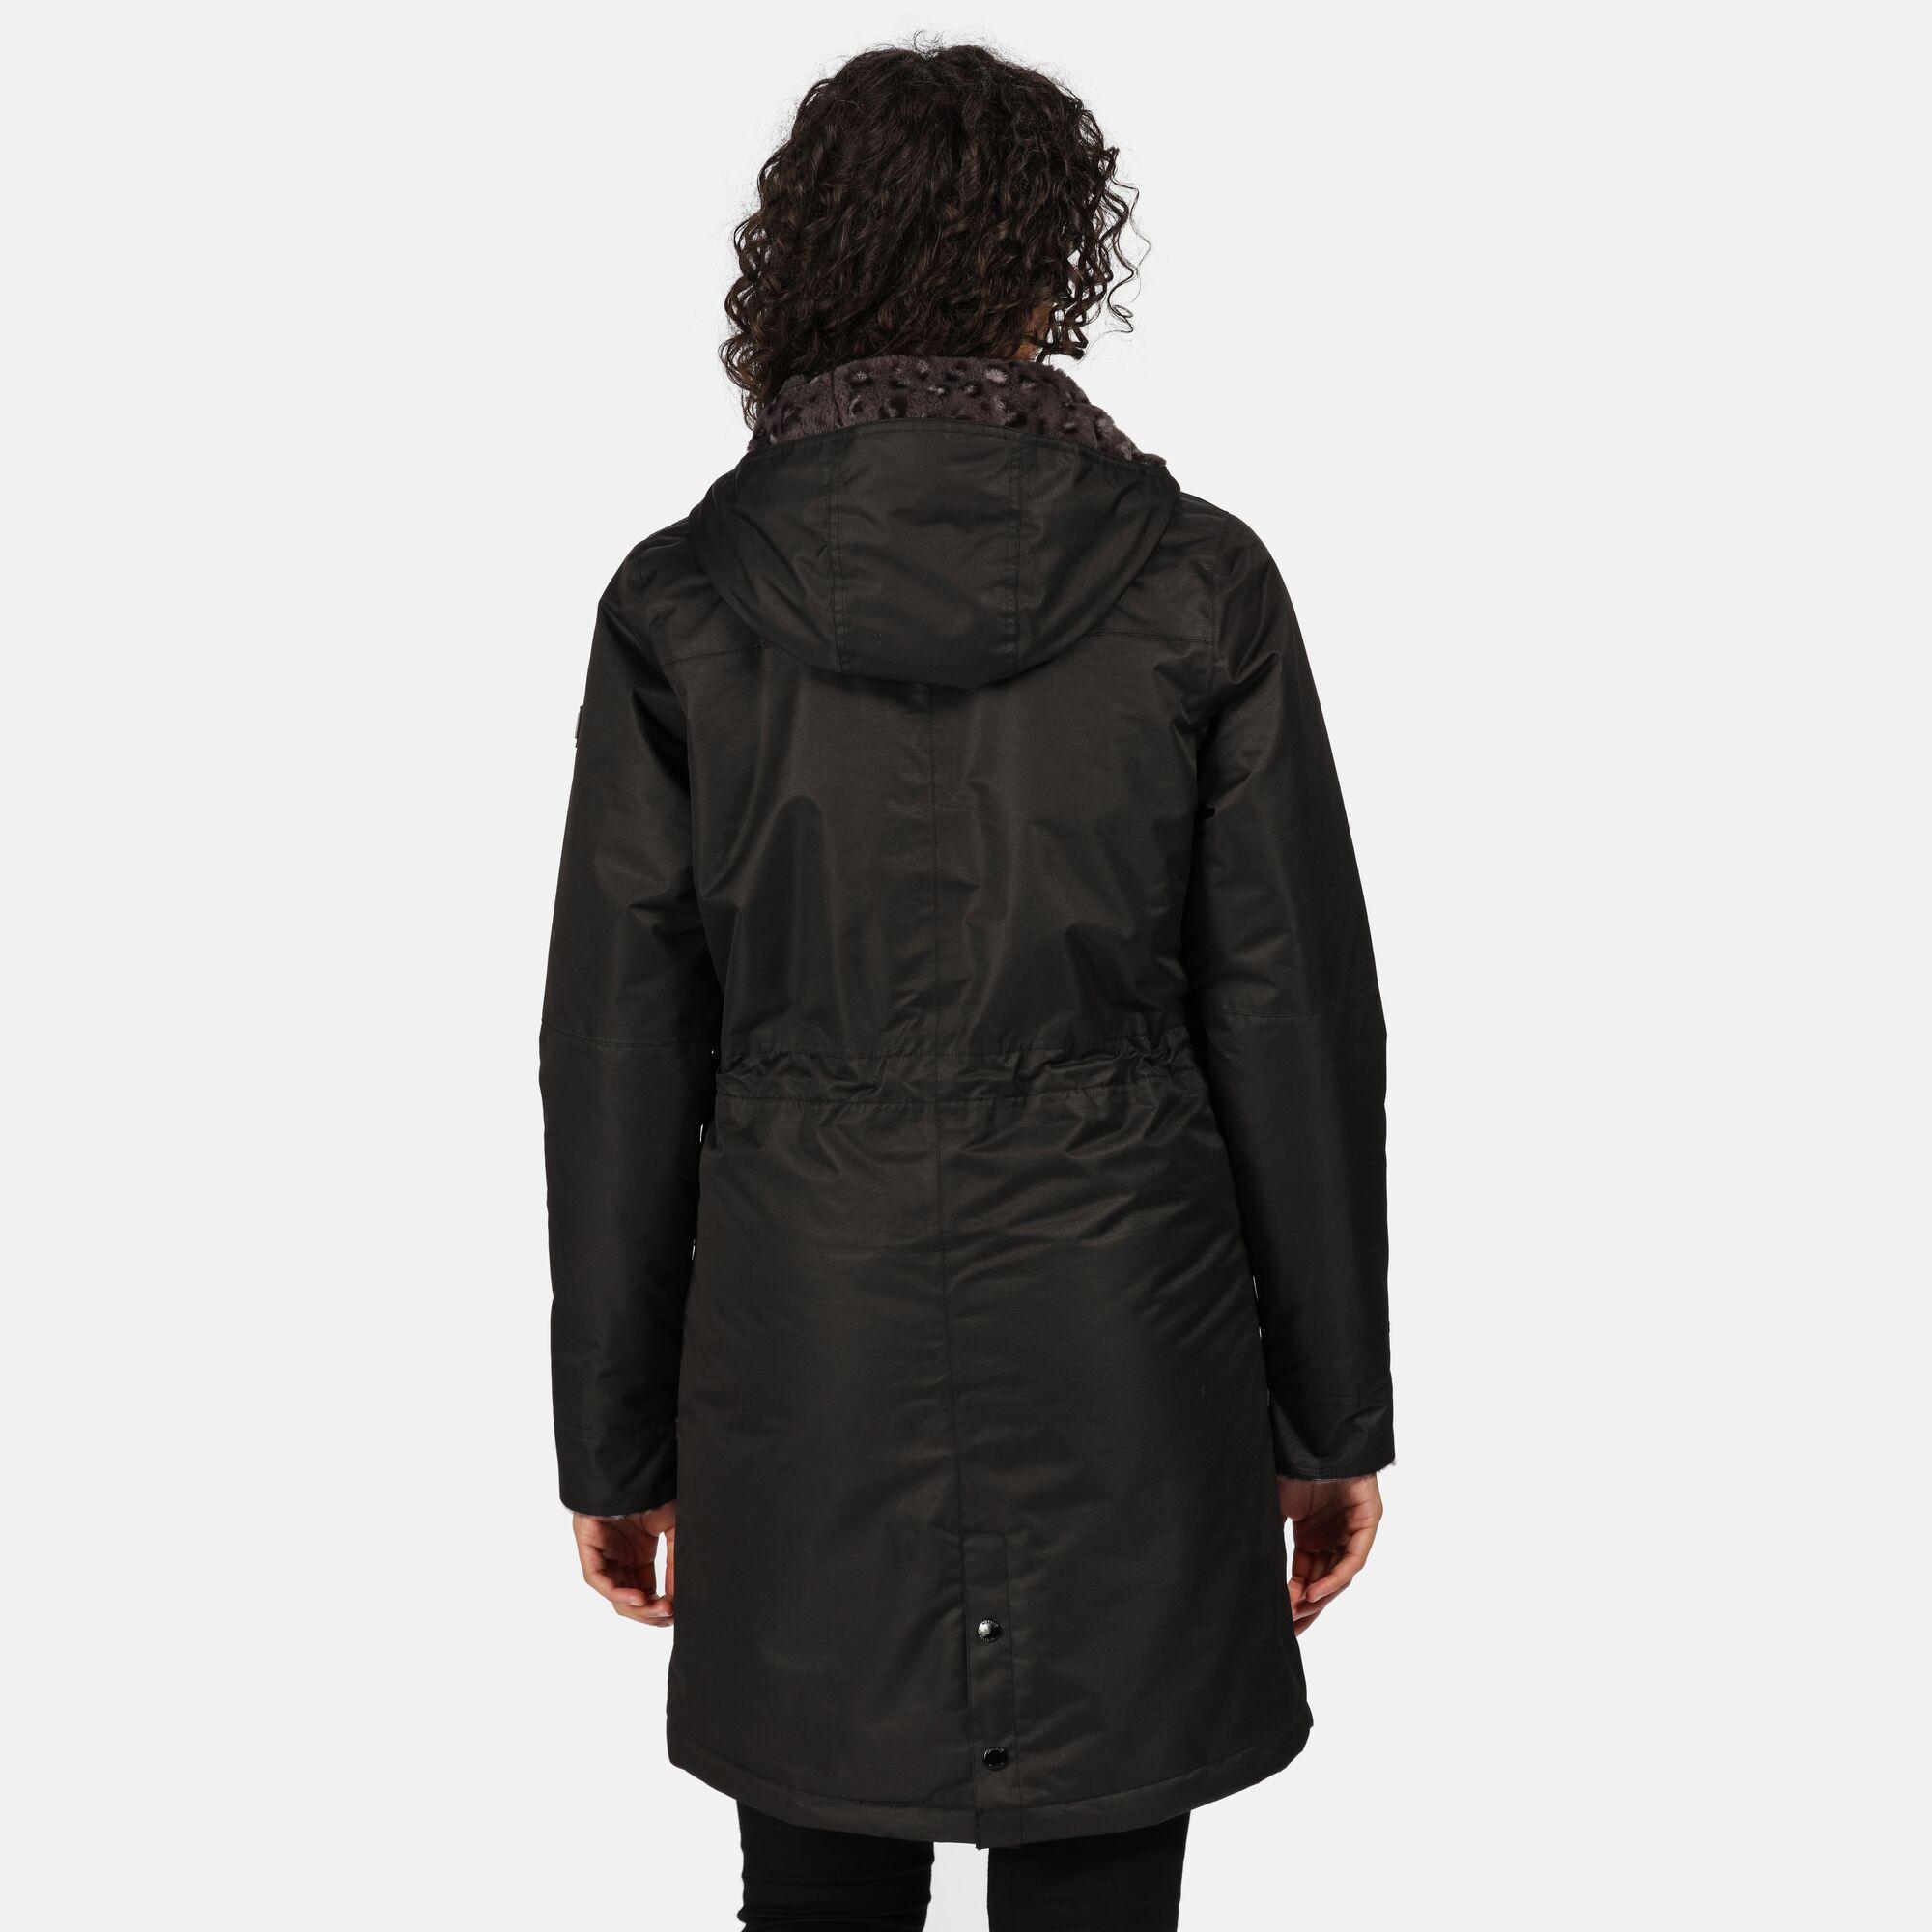 Regatta Womens/Ladies Rimona Hooded Waterproof Jacket (Black)